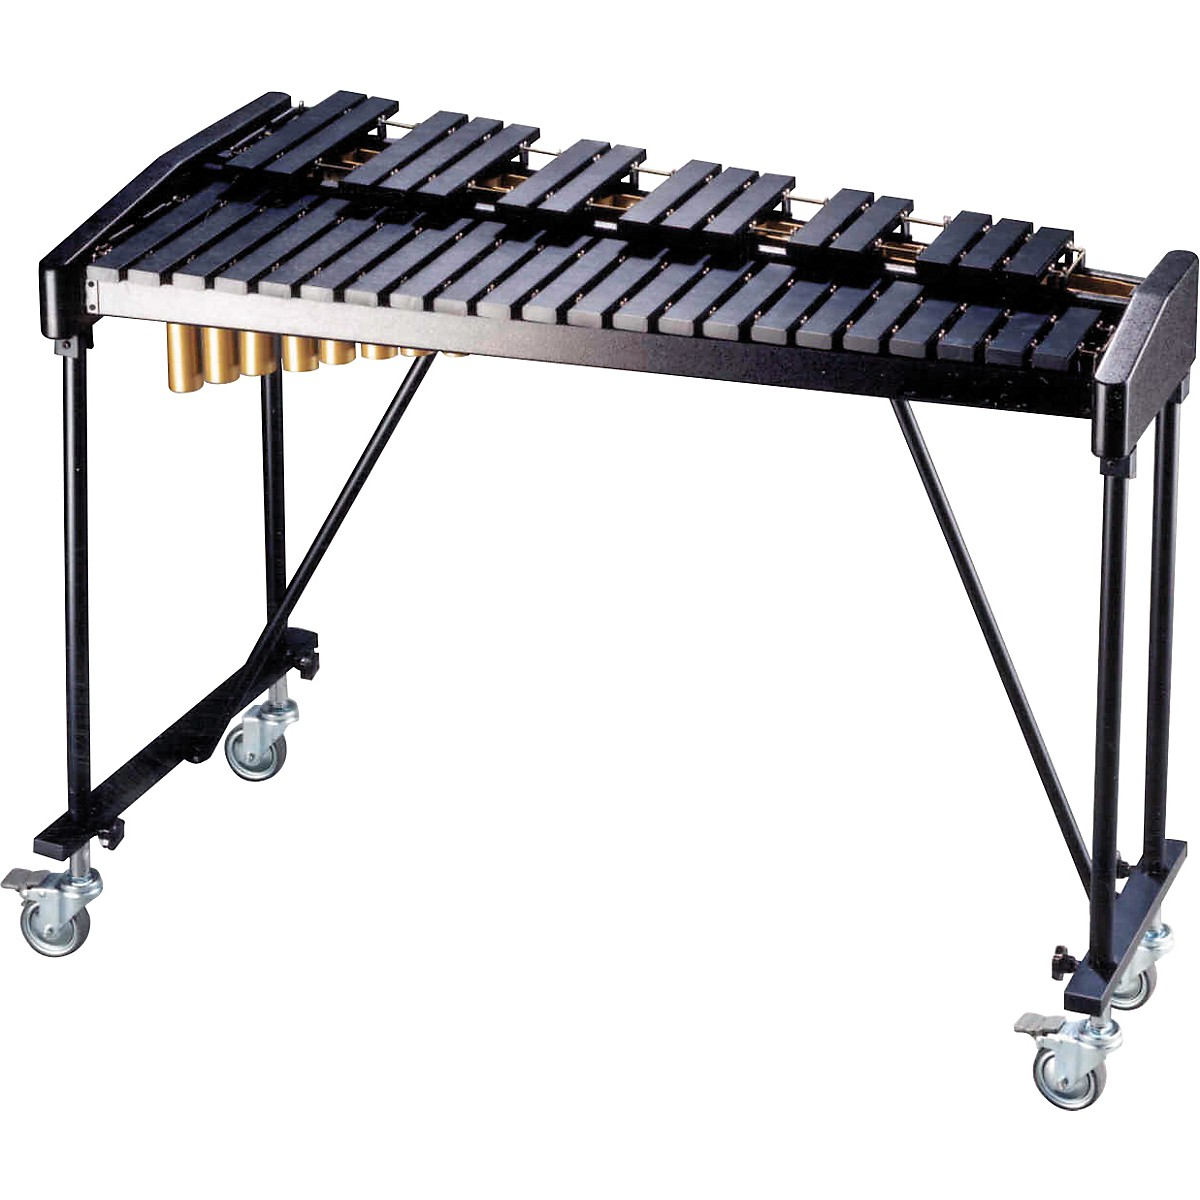 Musser Student Xylophone – Kelon Bars